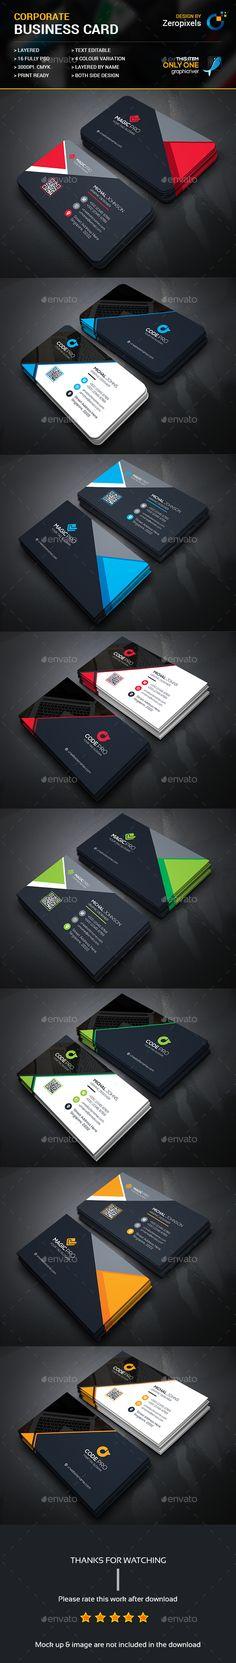 Business Card Templates PSD Bundle. Download here: https://graphicriver.net/item/business-card-bundle/17509004?ref=ksioks